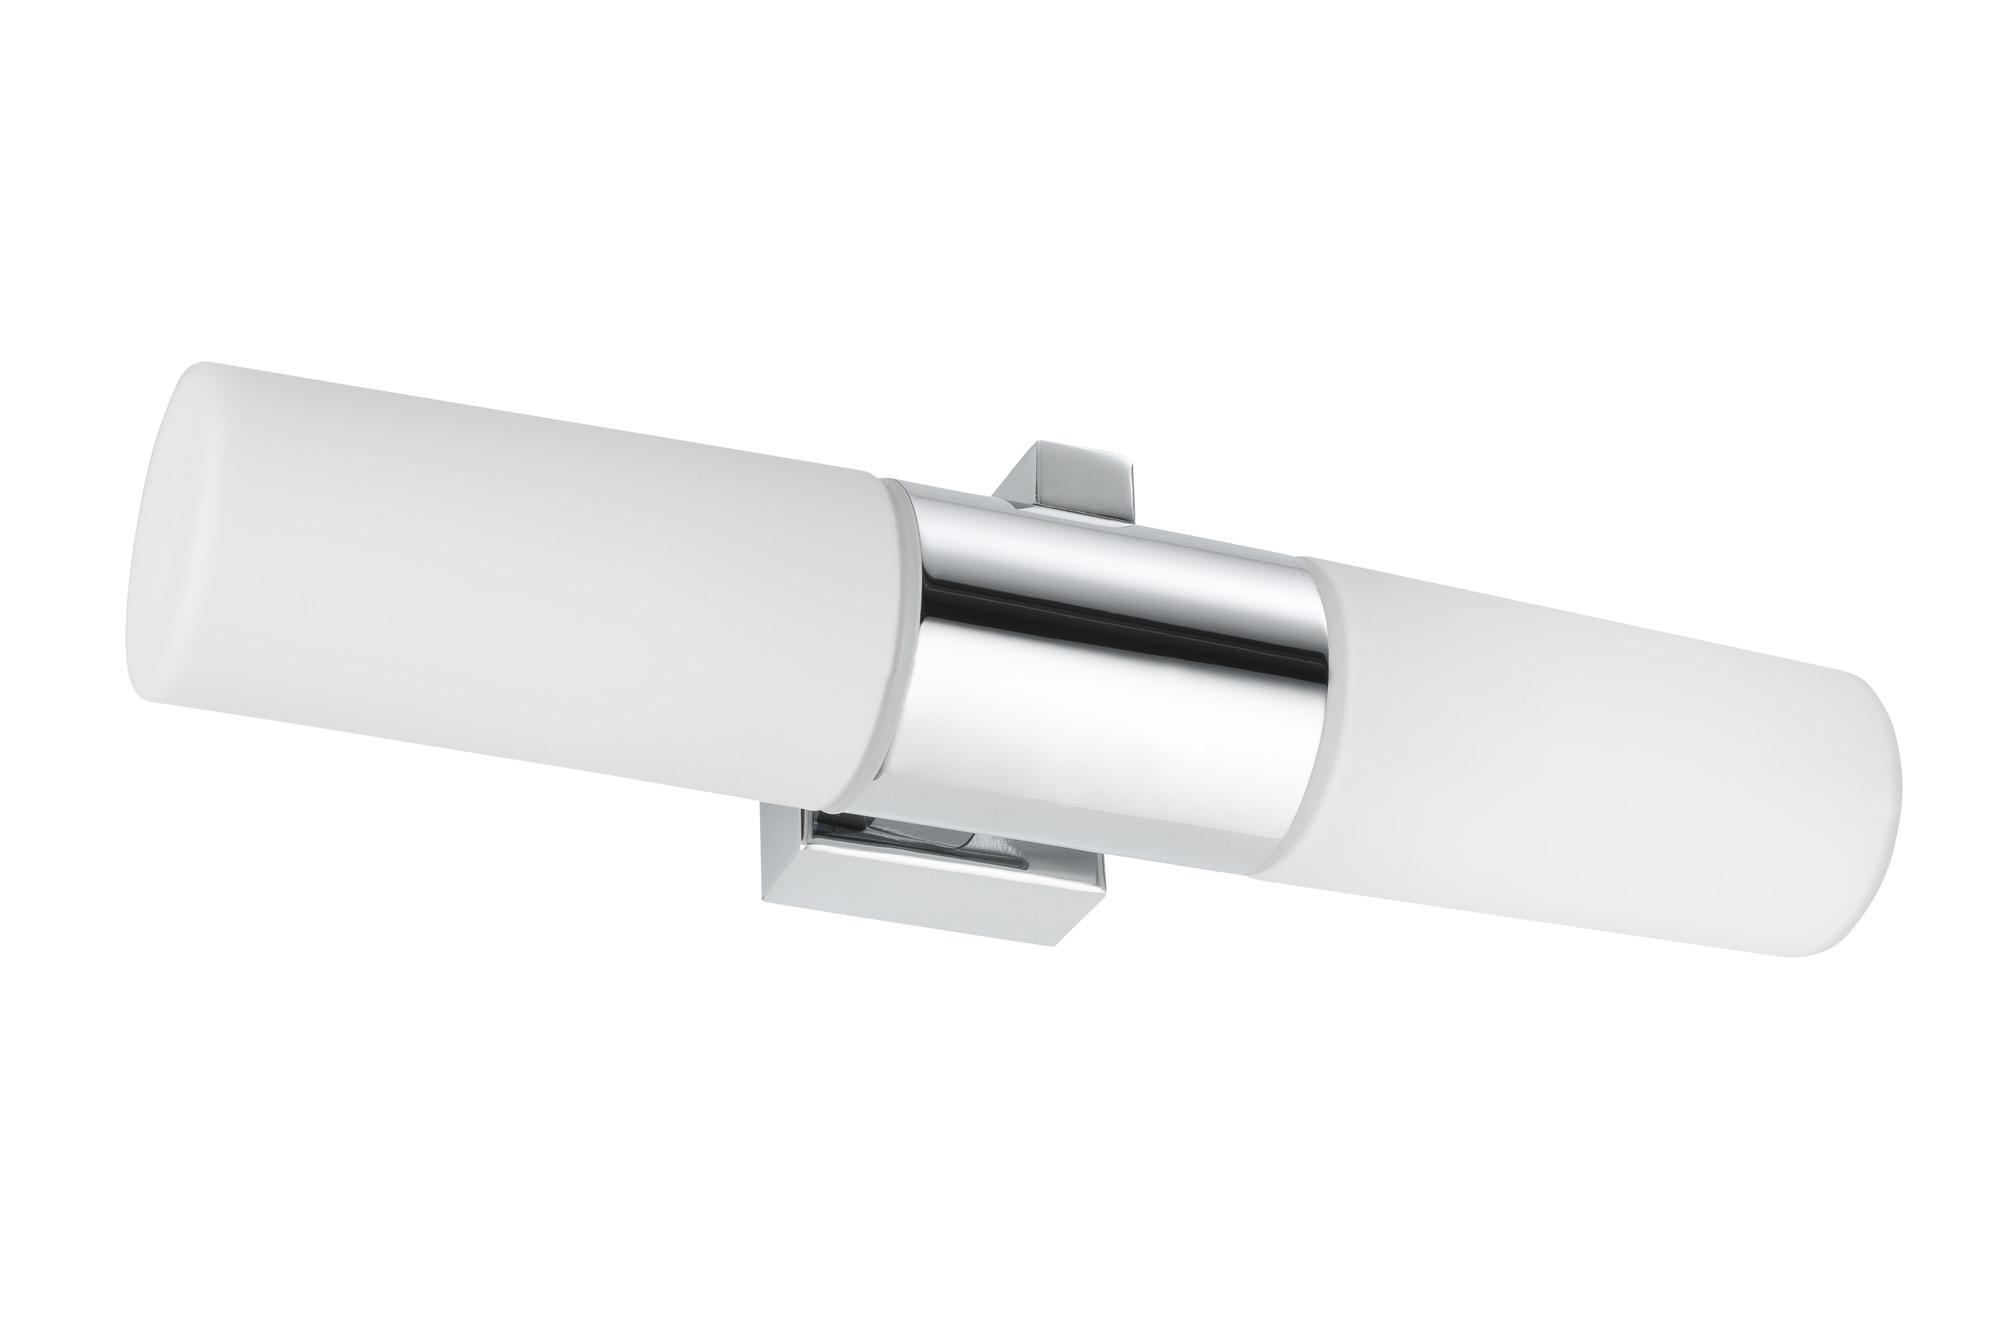 Paulmann. 70351 Светильник настенный 2x40W Gemini 230V E14 Хром/Сатин